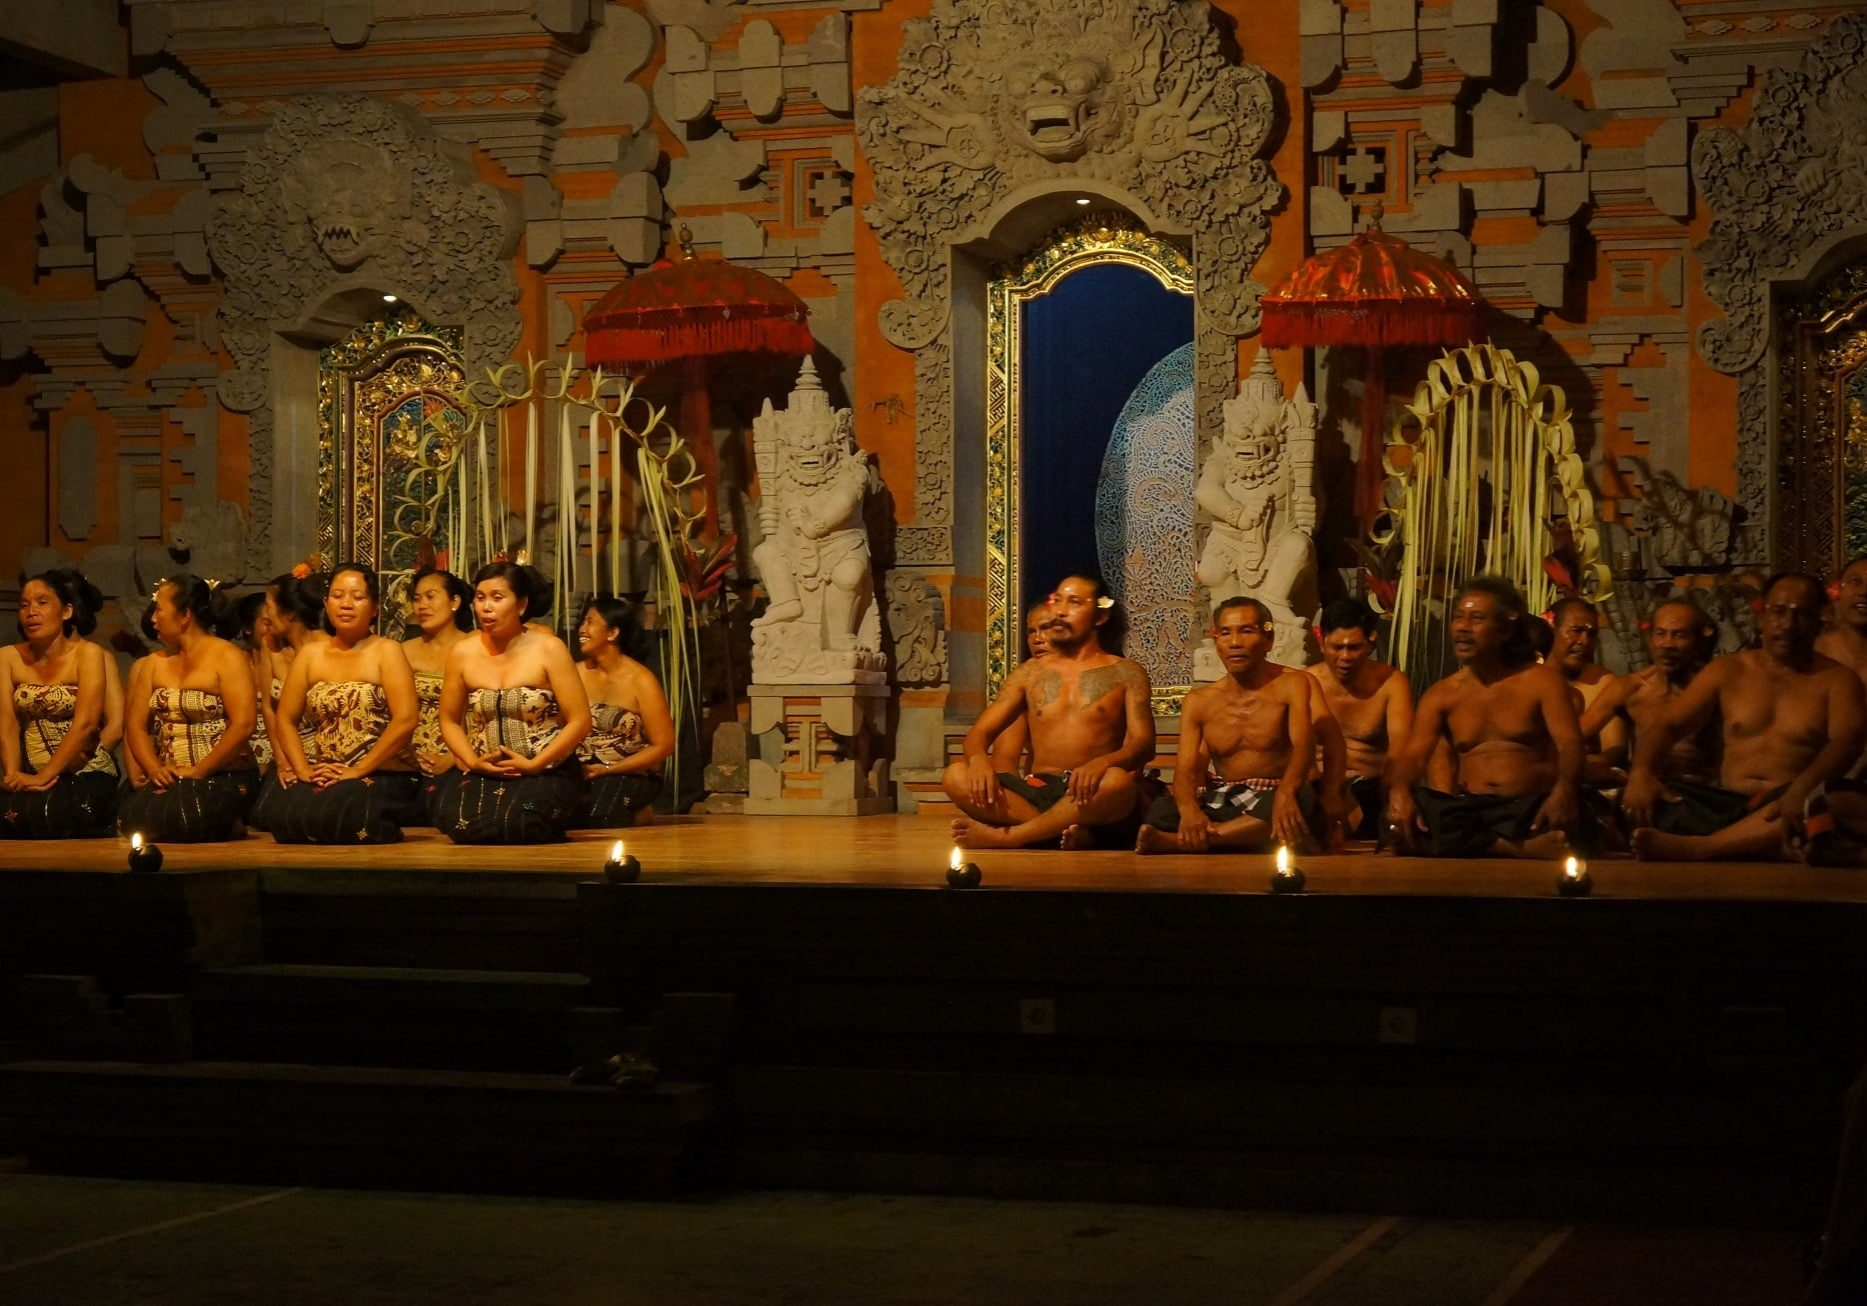 tanec Kečak, Bali, Ubud, Indonésie, Ásie, Vit Lastovka, Jaknacesty.cz (8)